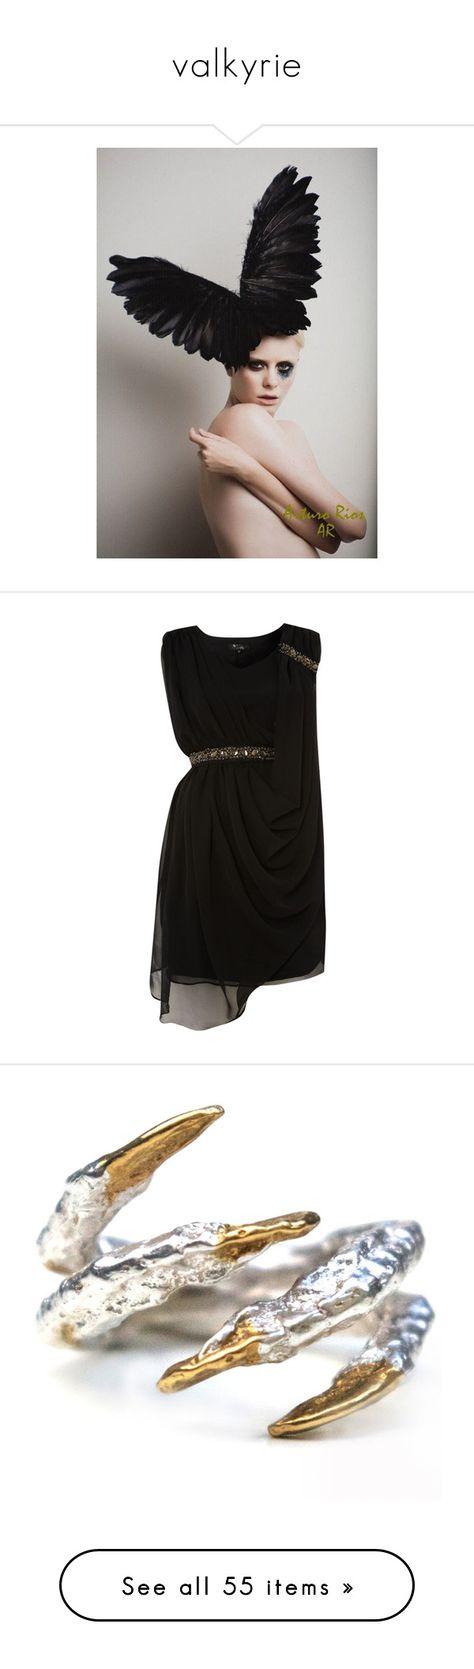 Valkyrie cocktail dress